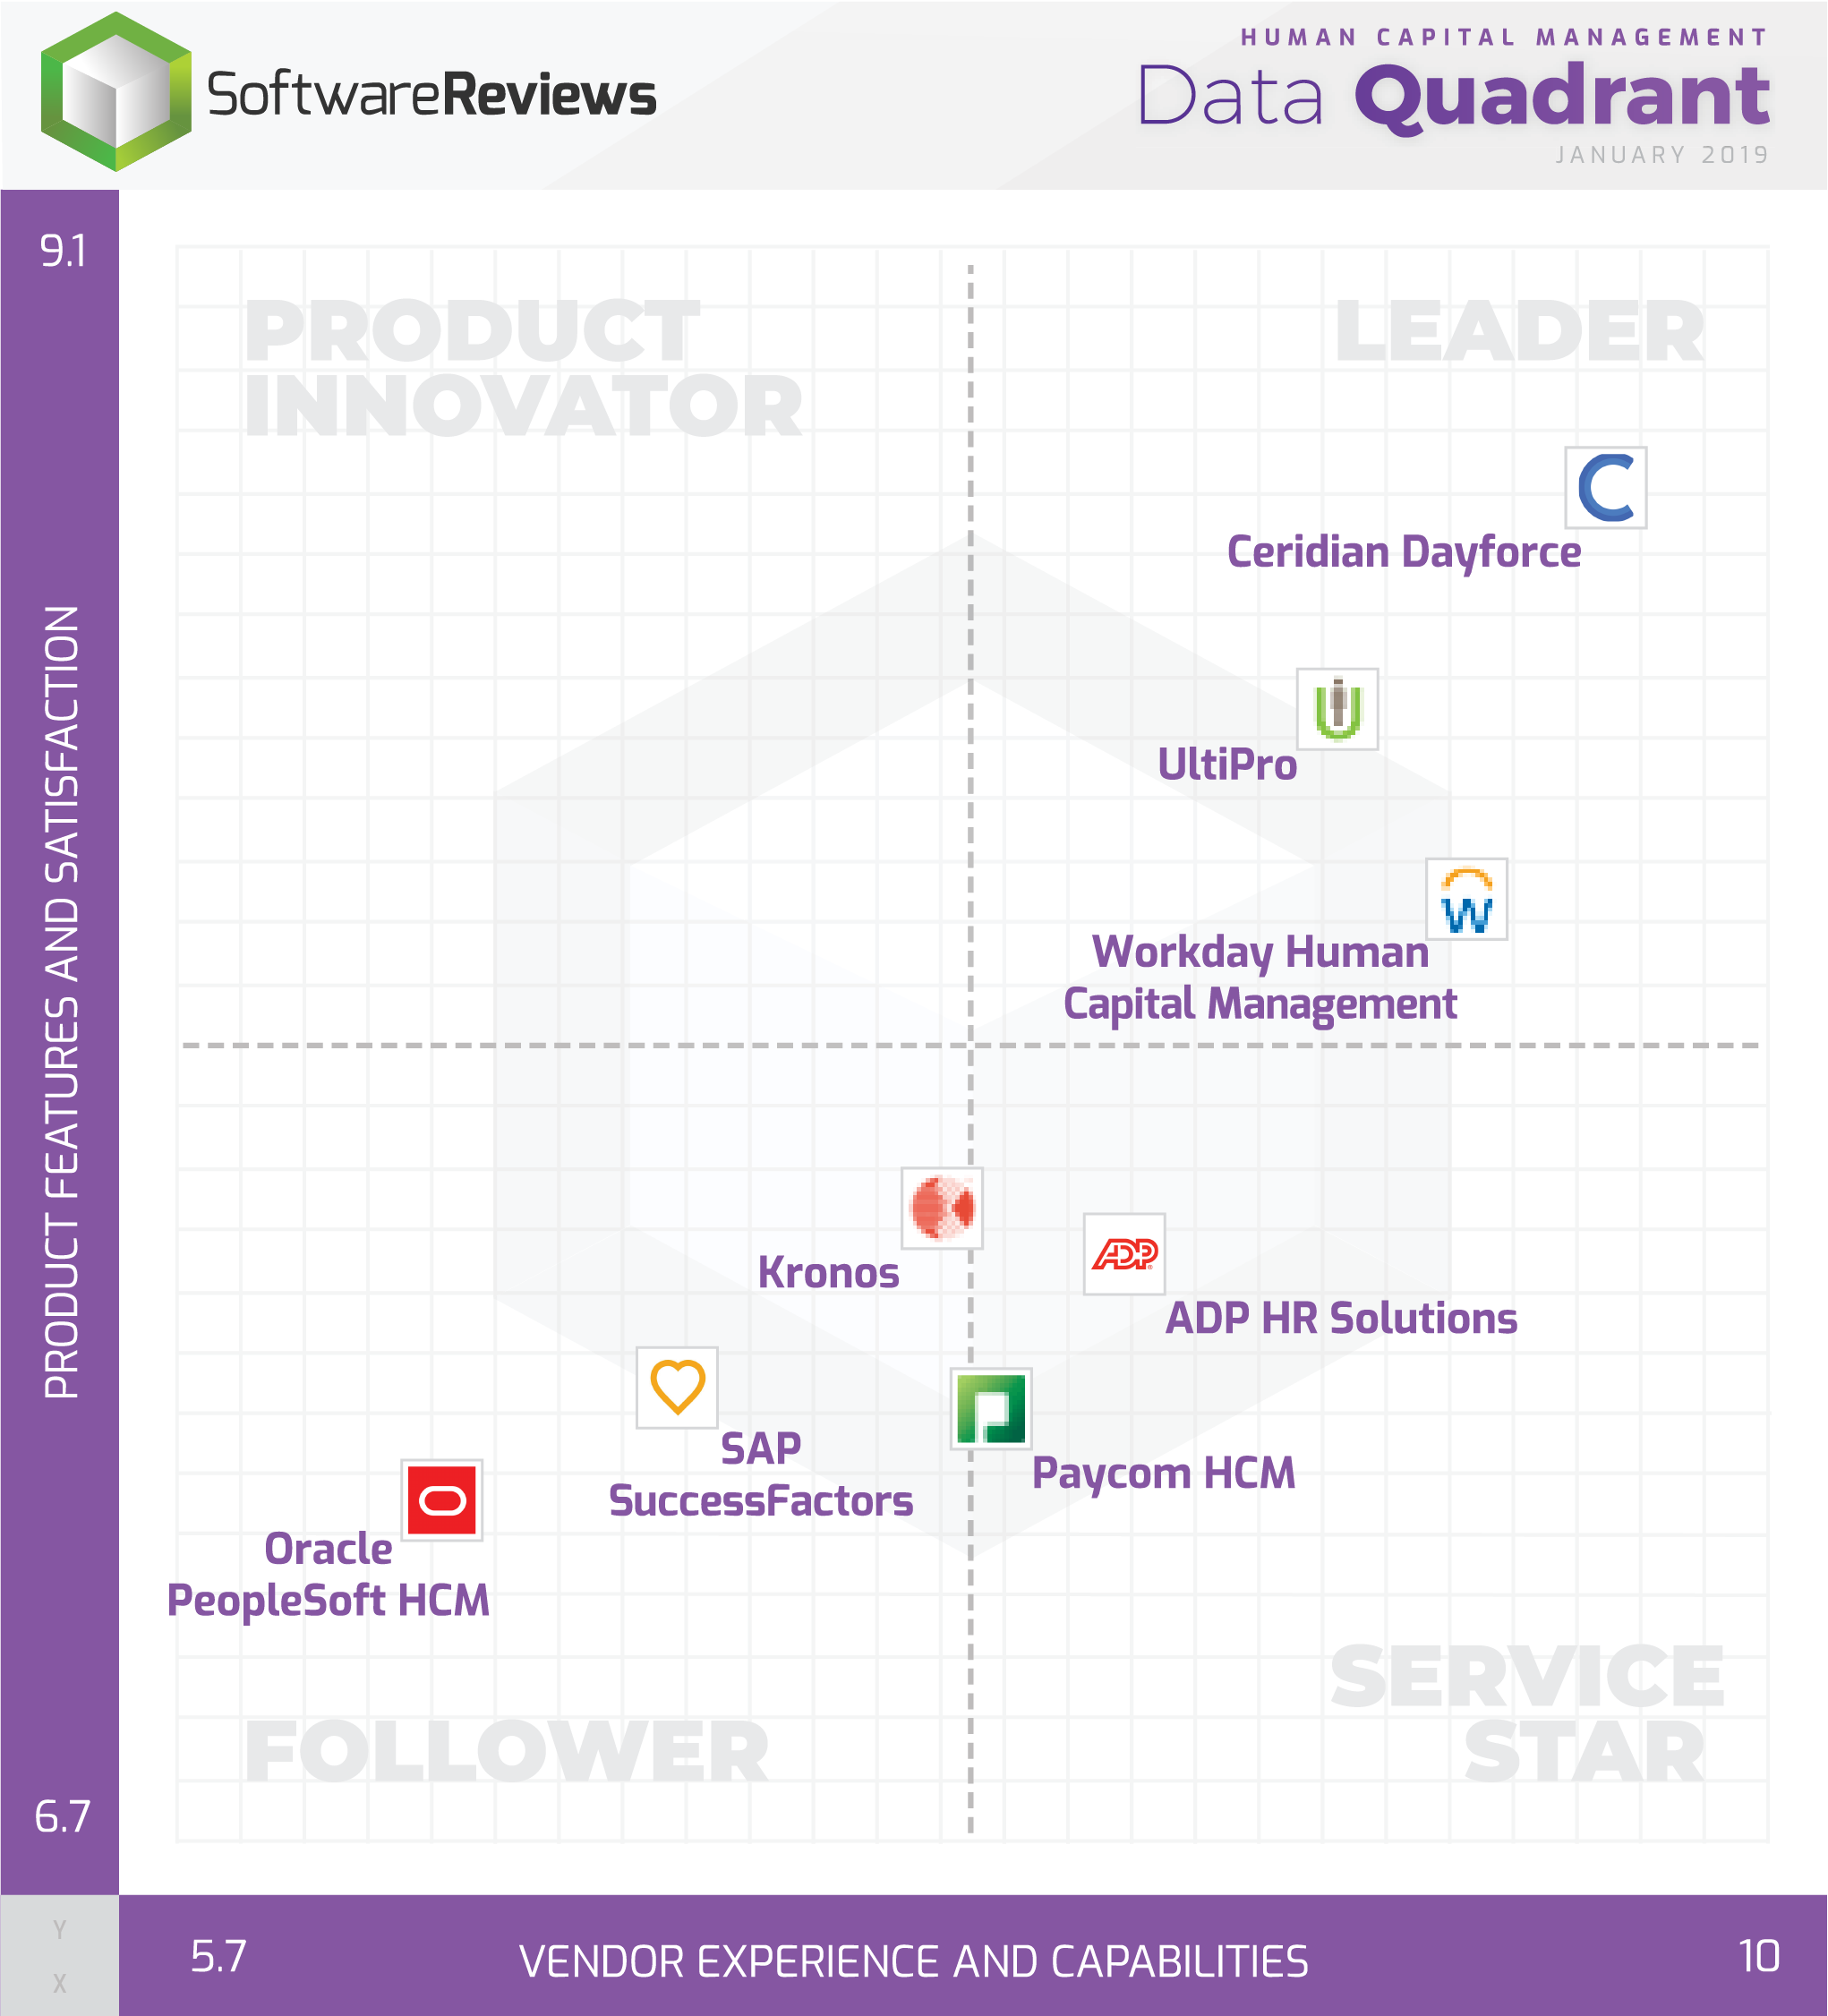 Human Capital Management Data Quadrant